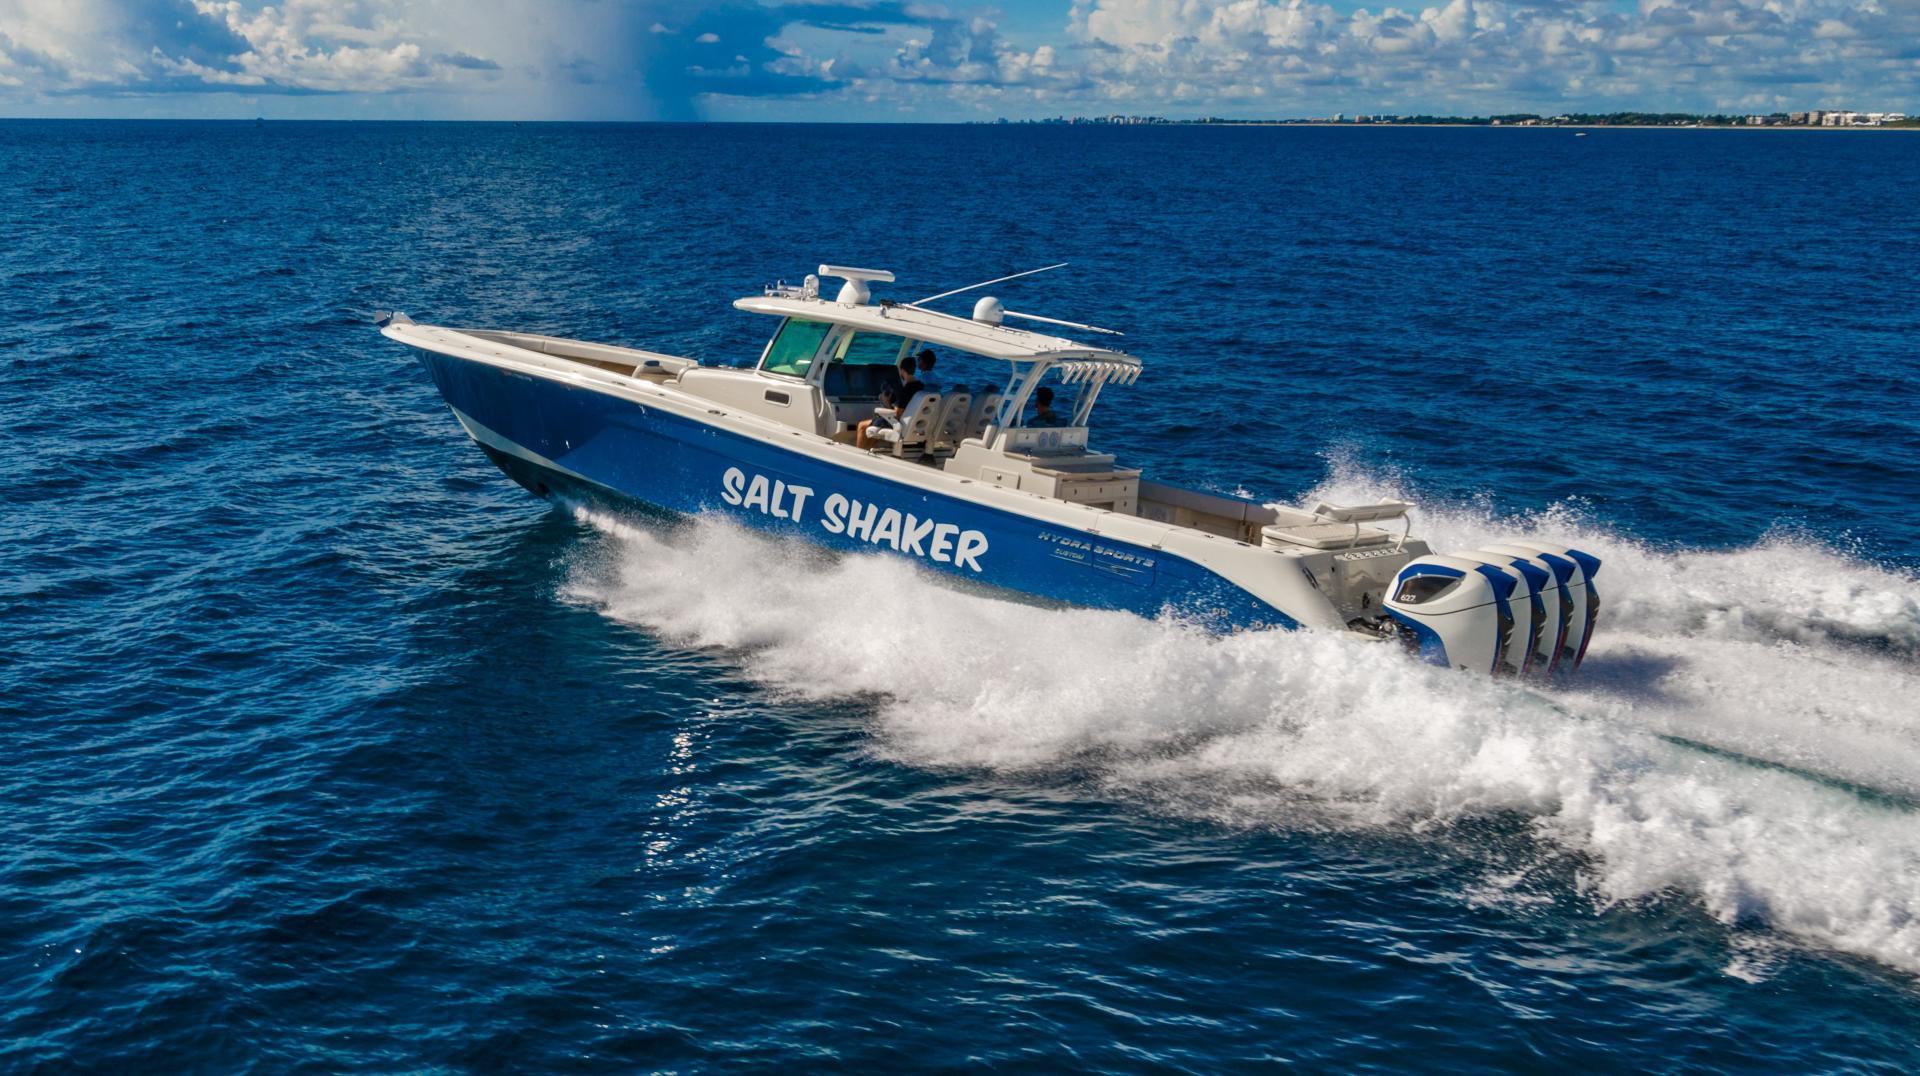 HCB-Suenos 2016-Salt Shaker Ft. Lauderdale-Florida-United States-1548628 | Thumbnail